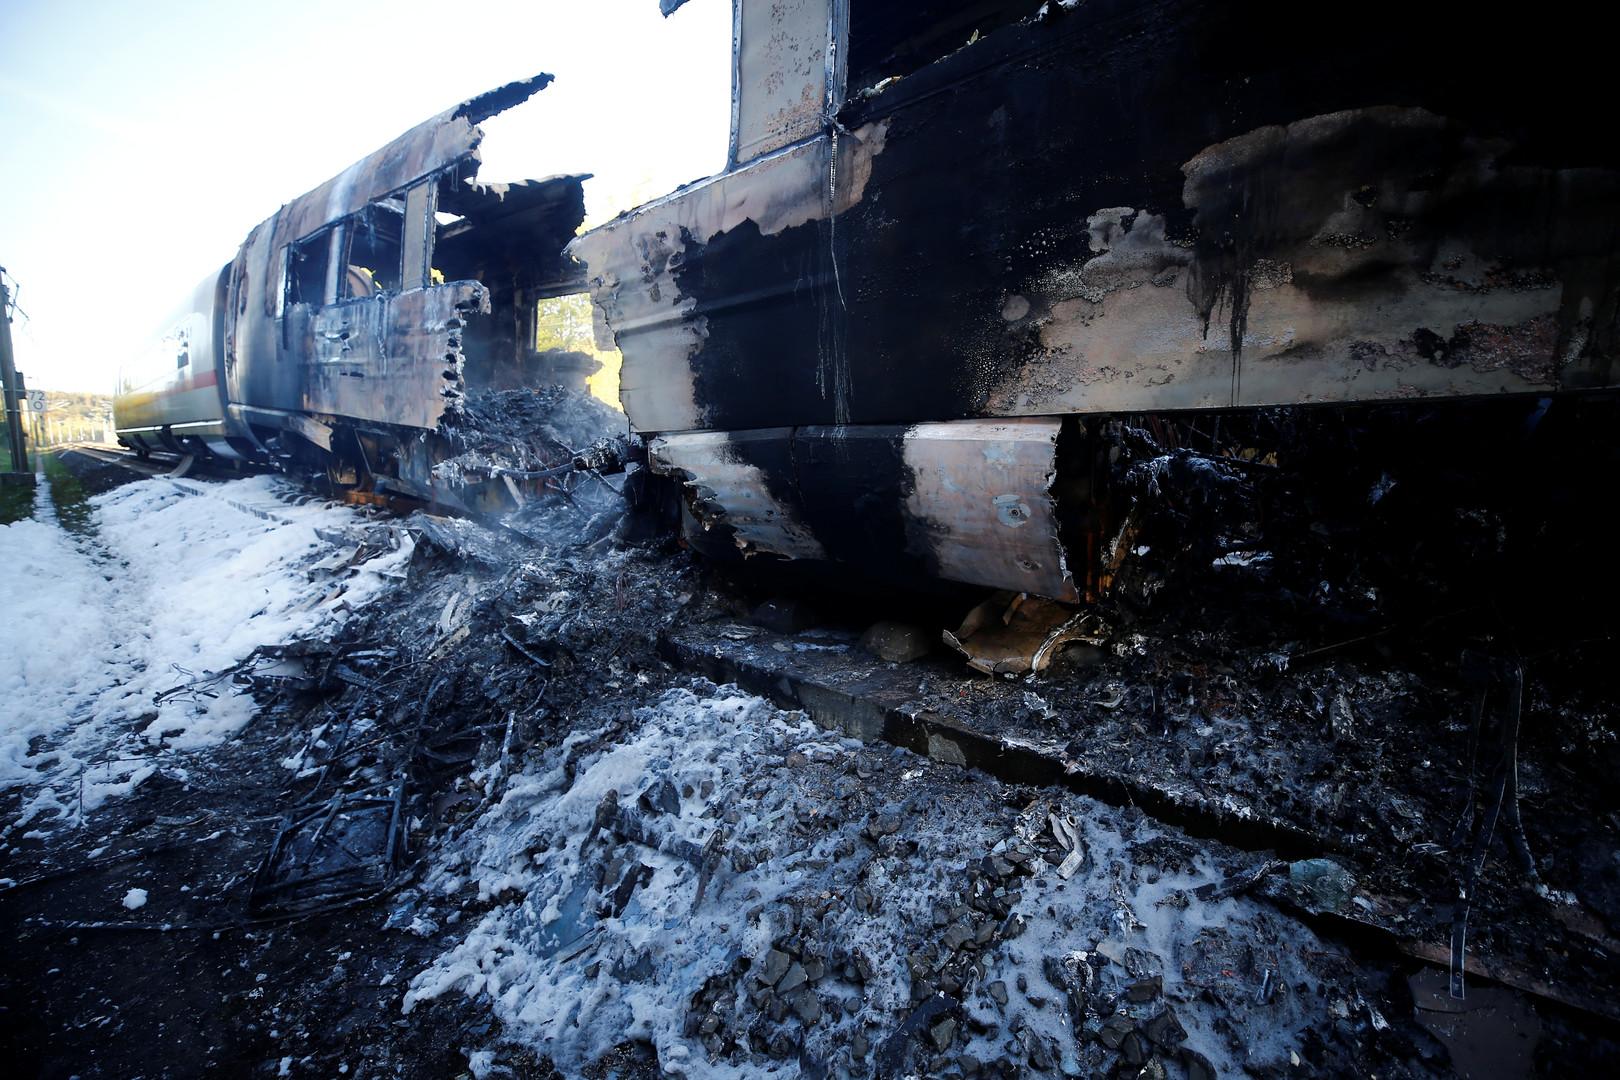 ICE-Wagon völlig ausgebrannt: Bahn-Schnellstrecke Frankfurt-Köln gesperrt